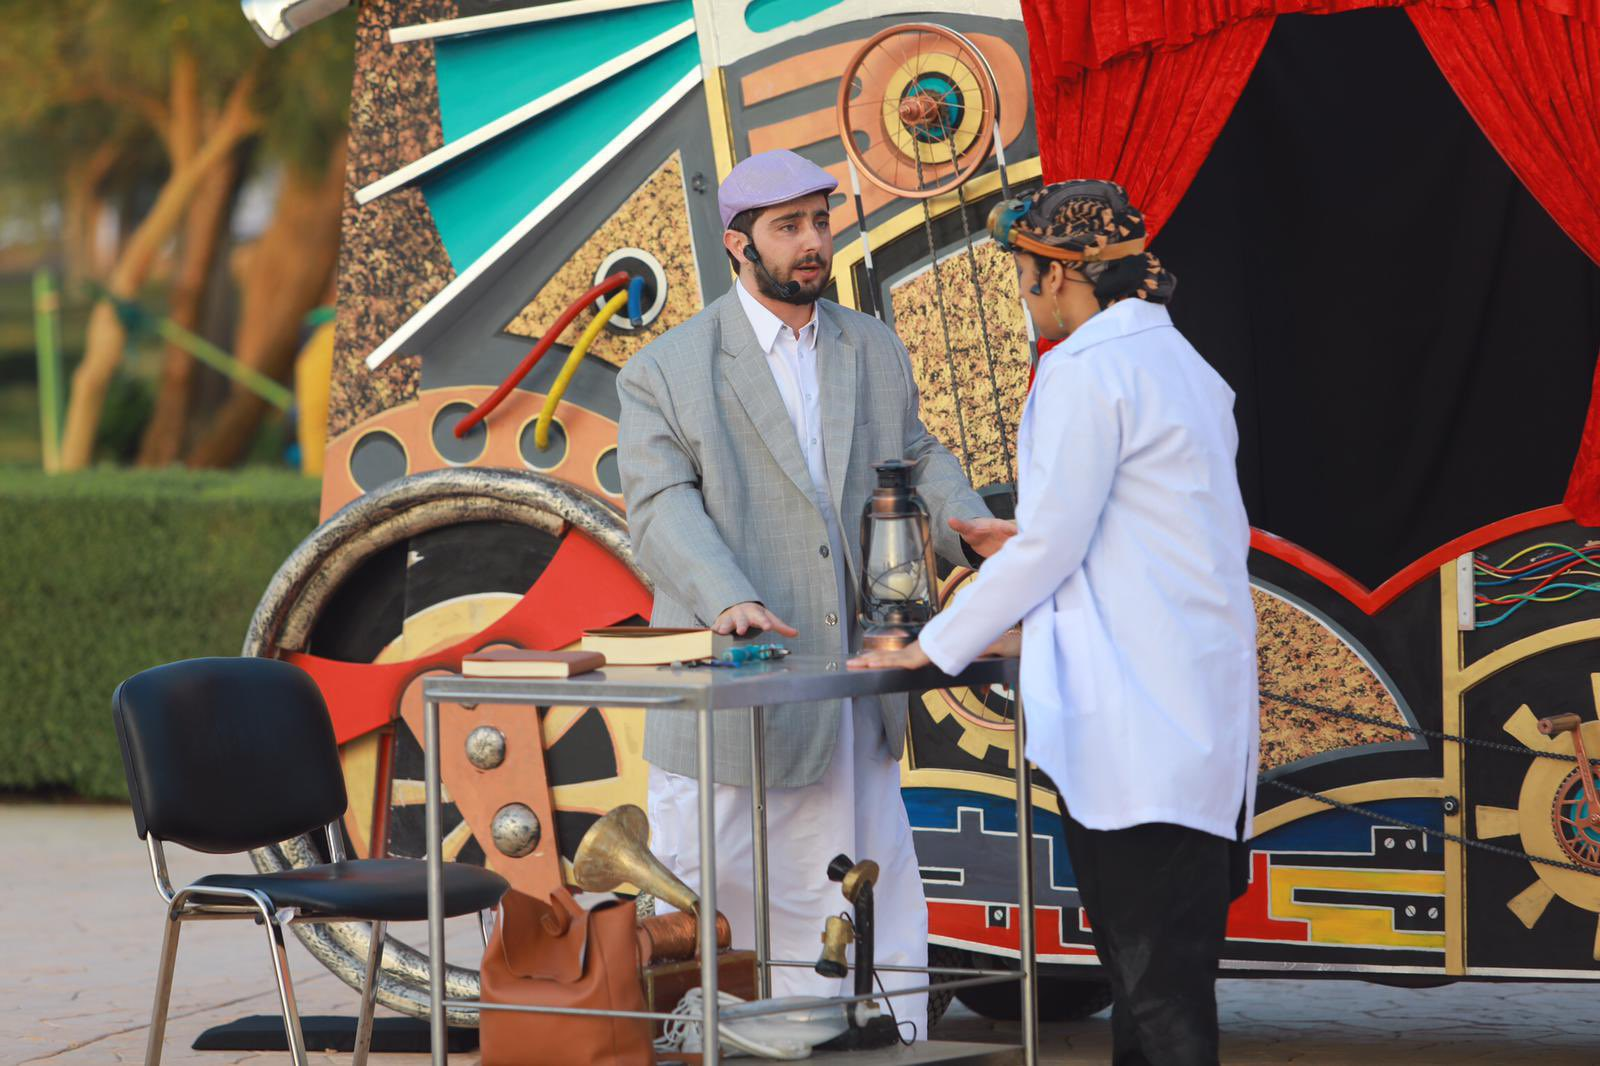 Mobile theatre show staged at Al Khor Park